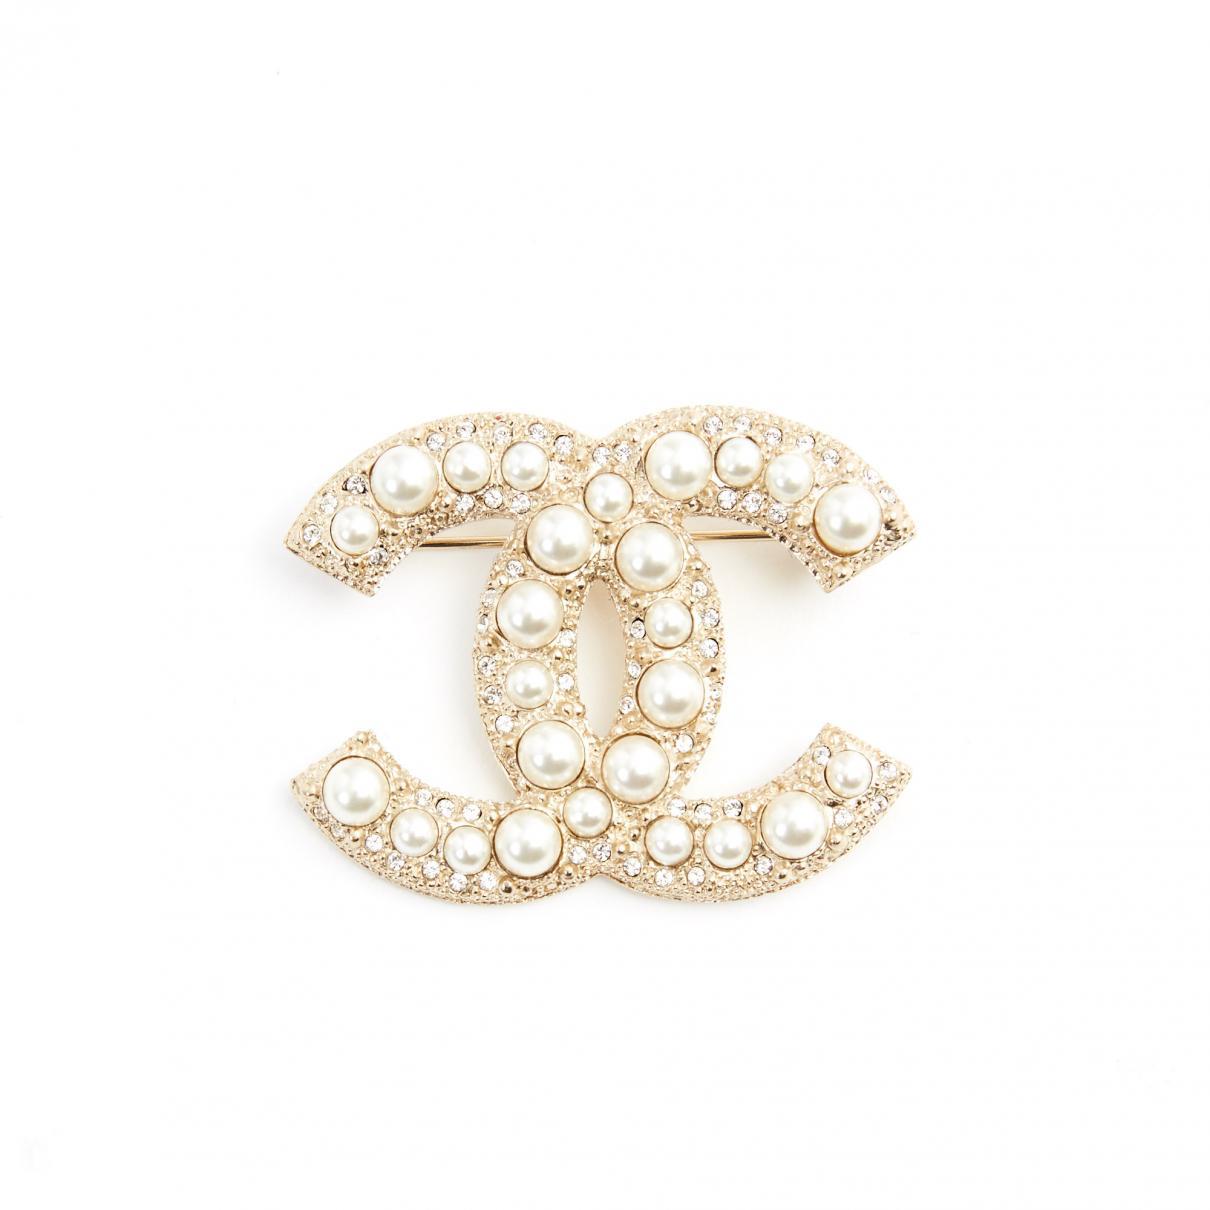 Lyst - Chanel Pre-owned Pin   Brooche in Metallic a5fec2f228d